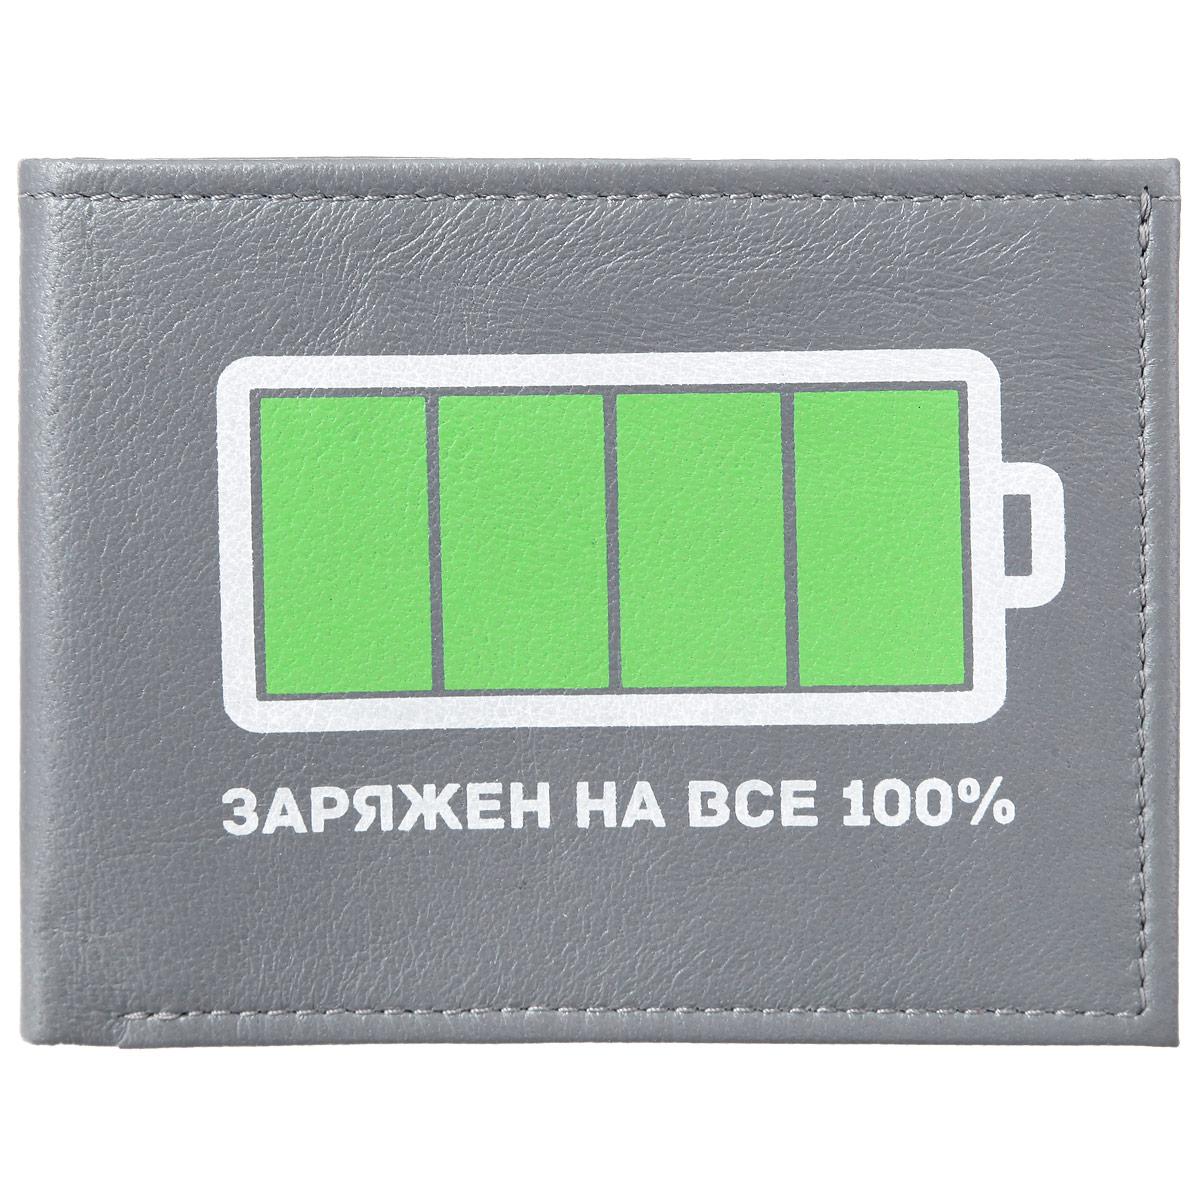 Портмоне ОРЗ-Дизайн